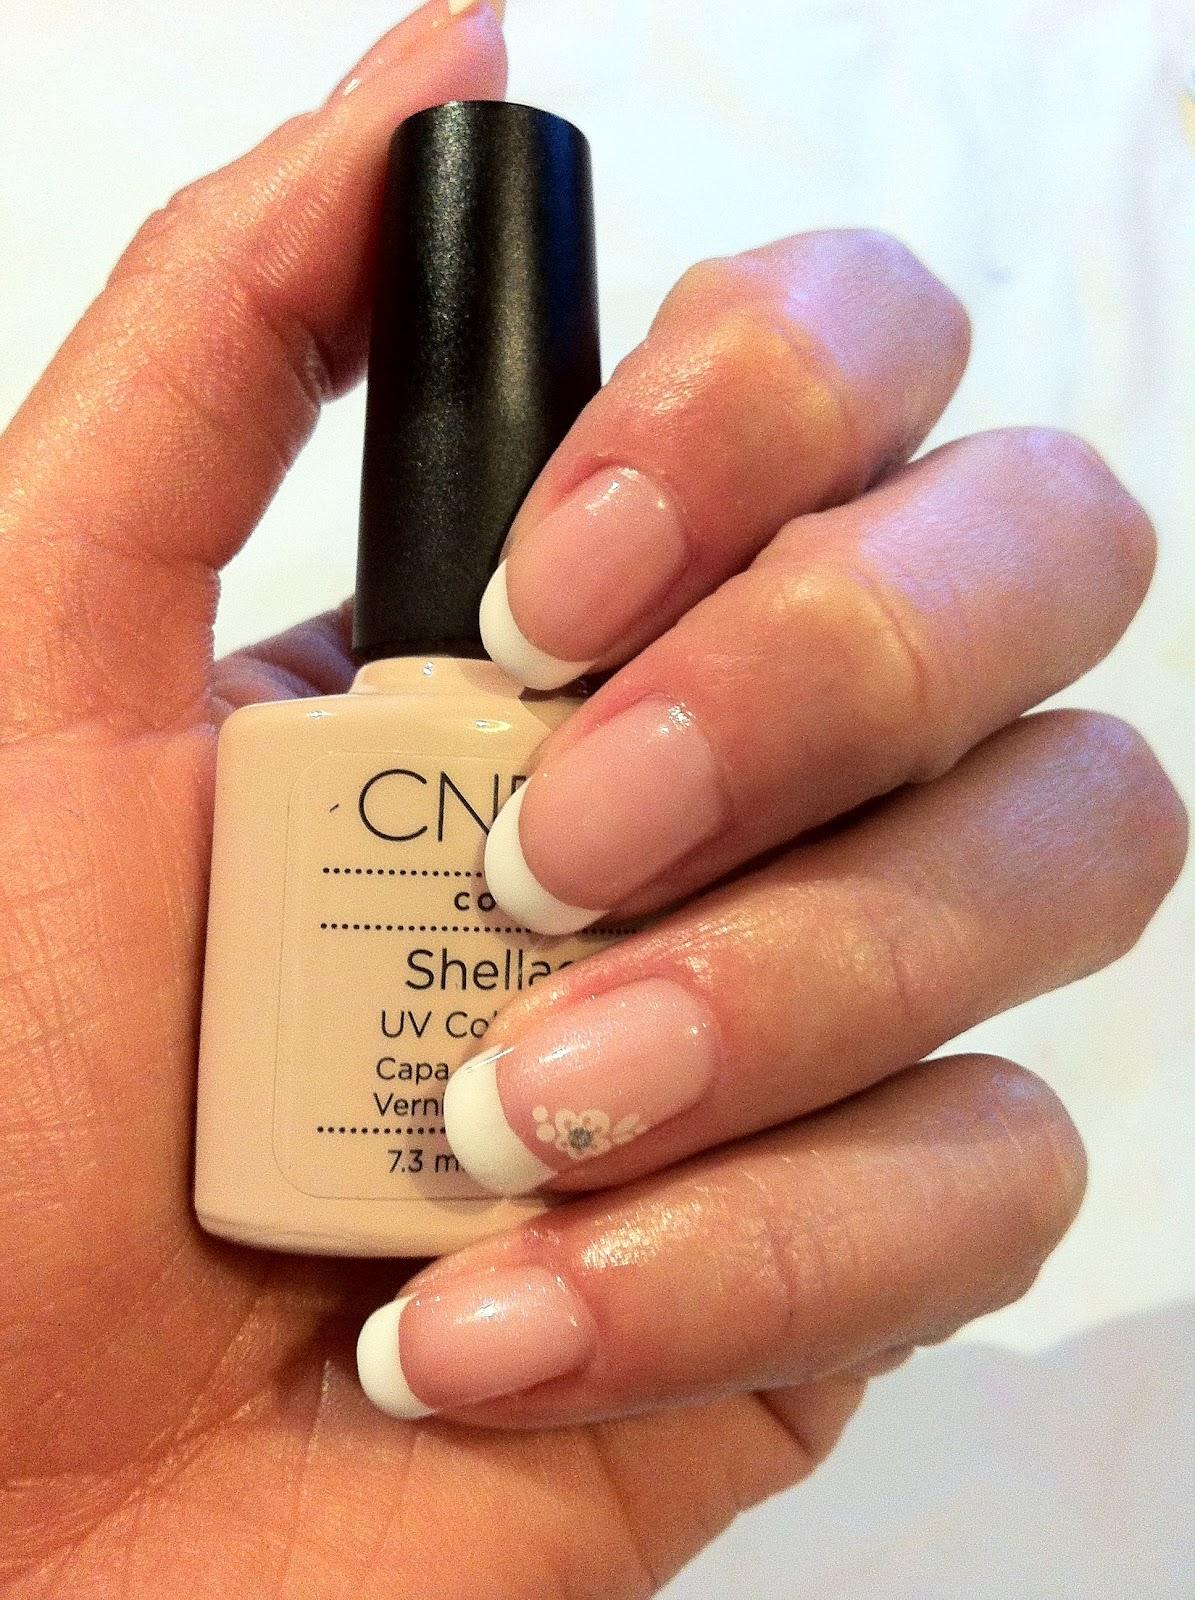 Brush up and Polish up!: CND Shellac Nail Art - French, French ...